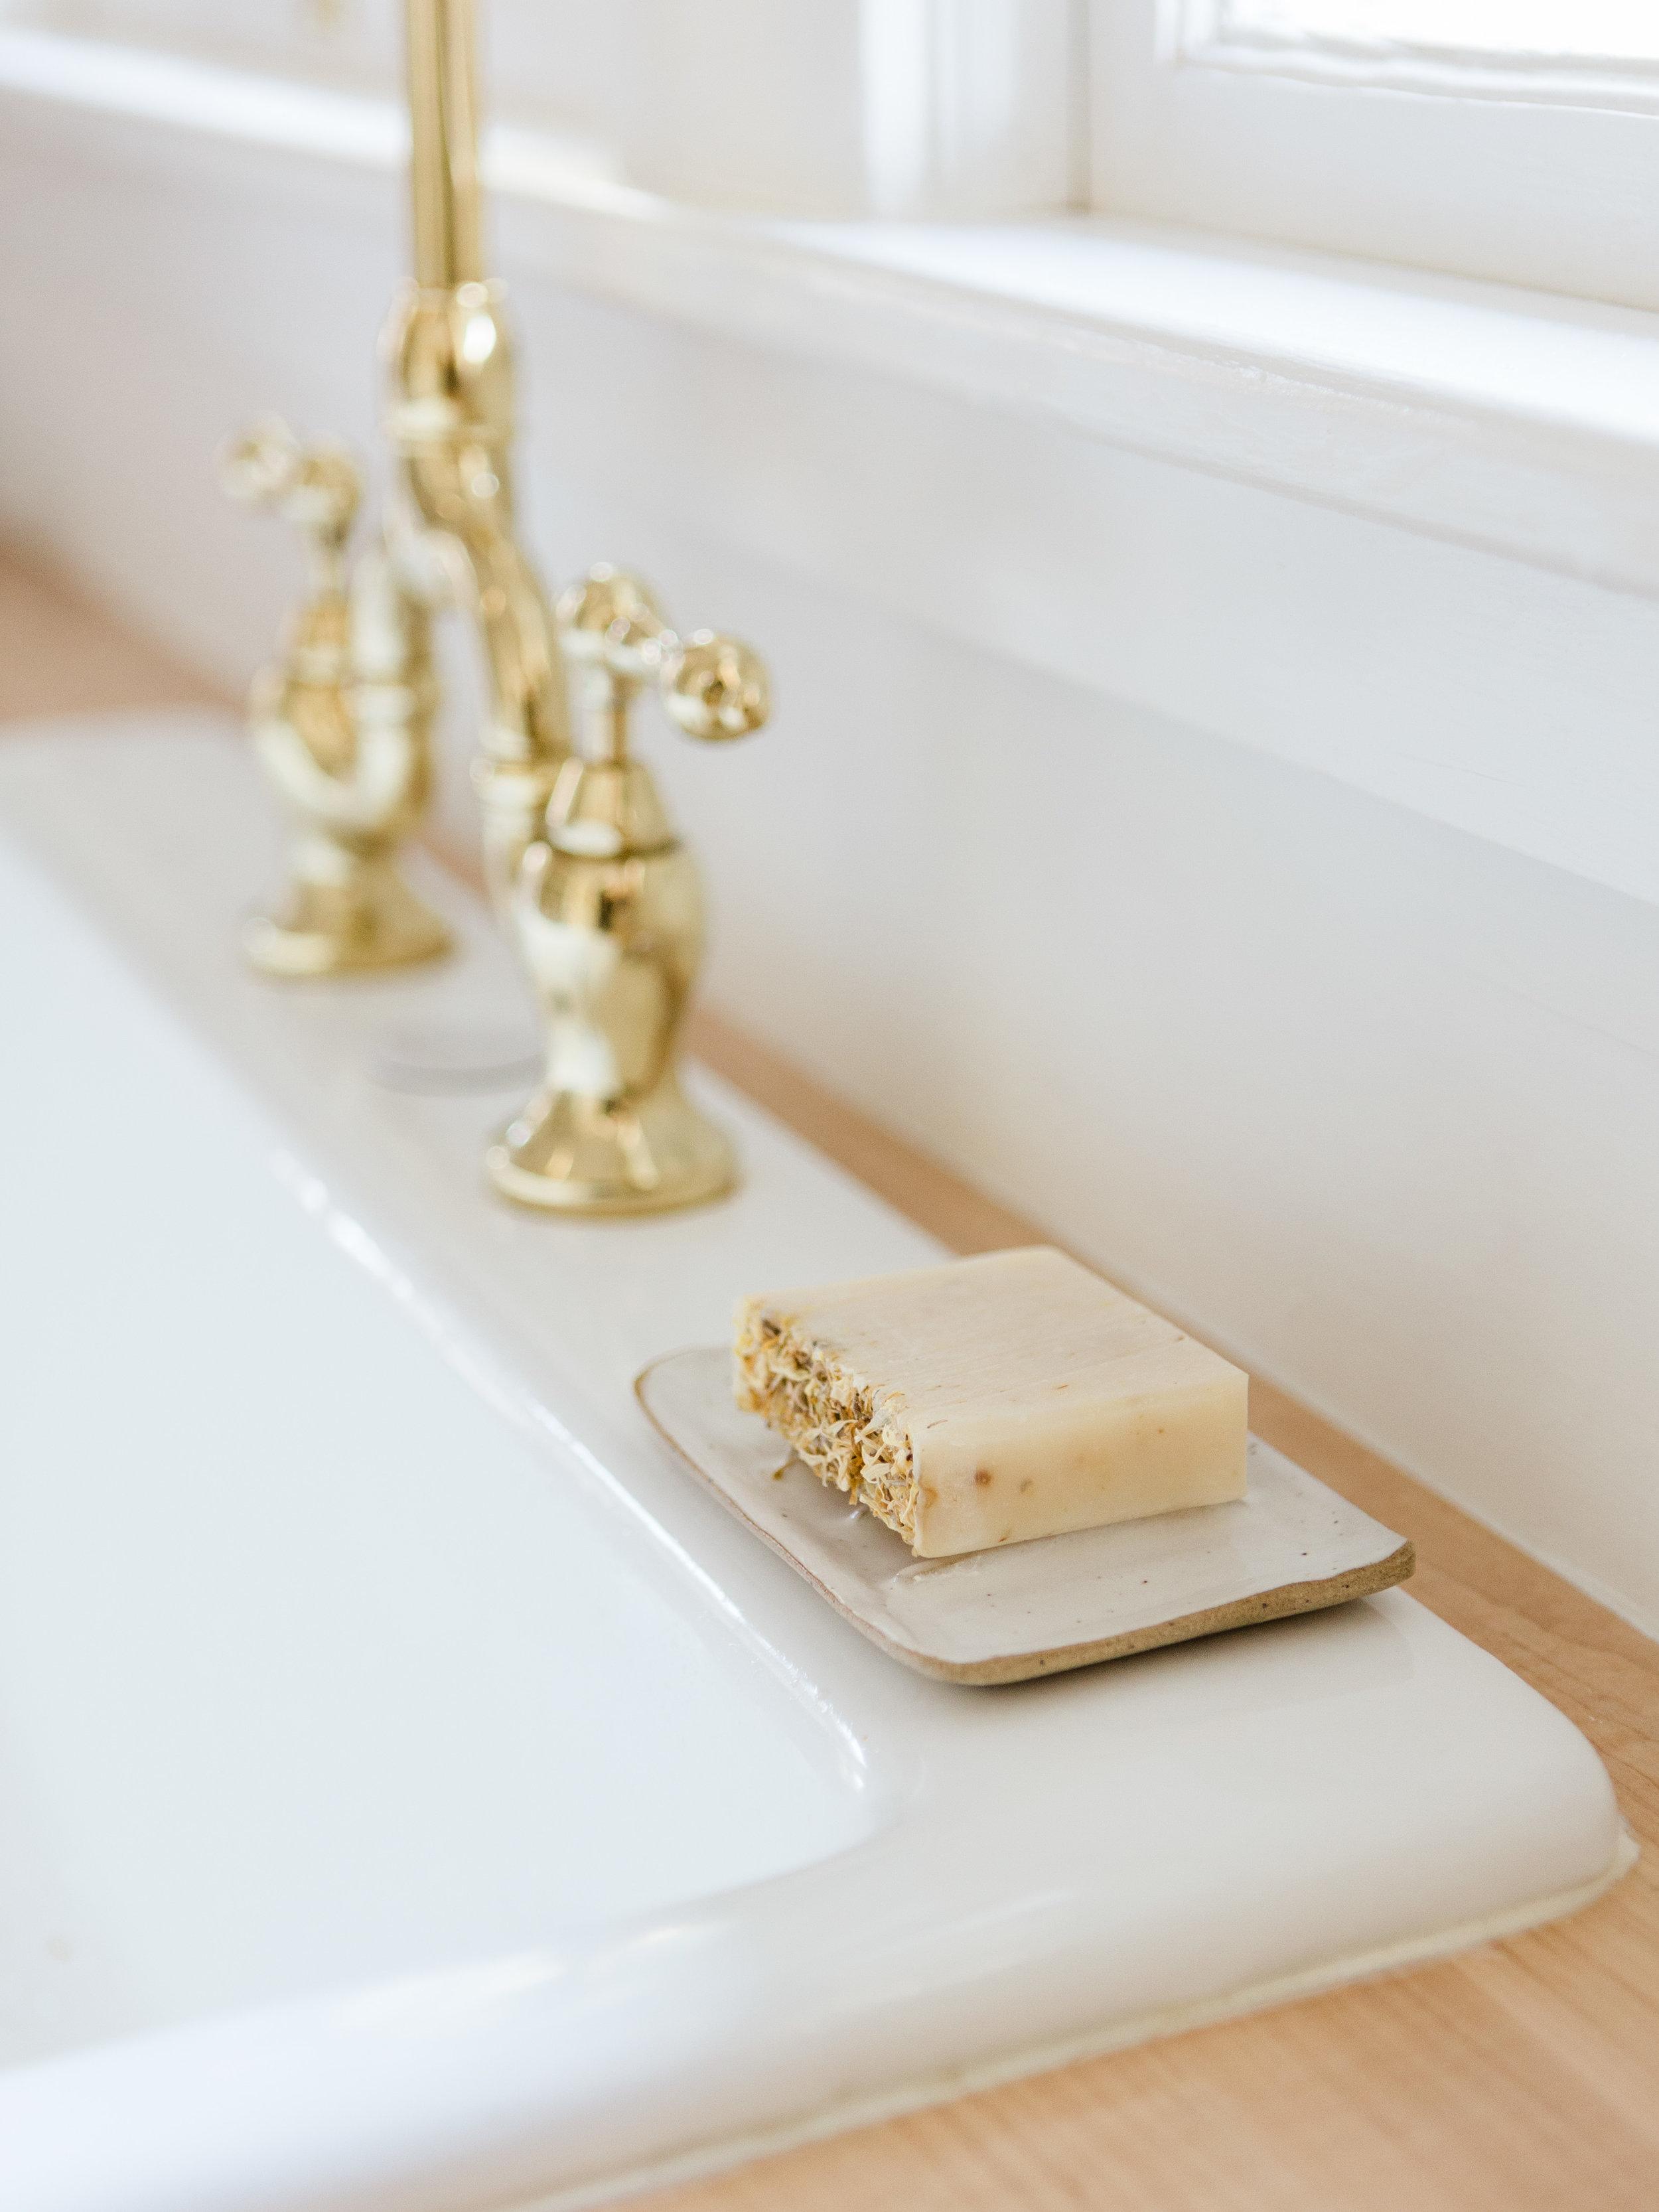 ceramic soap dish in neutral colors